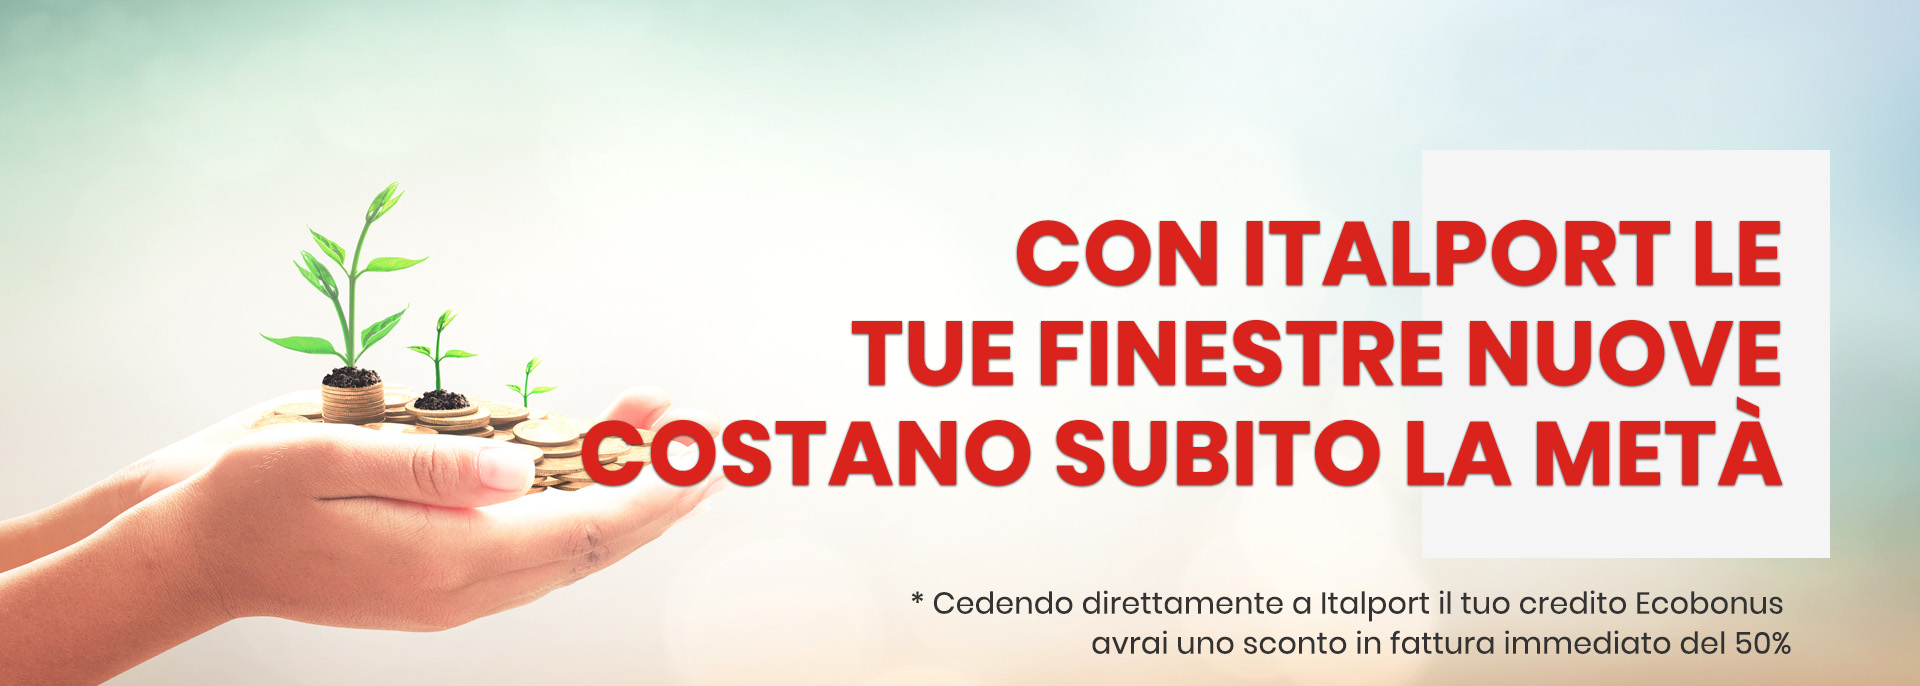 italport-cessione-credito-ecobonus-slide-new